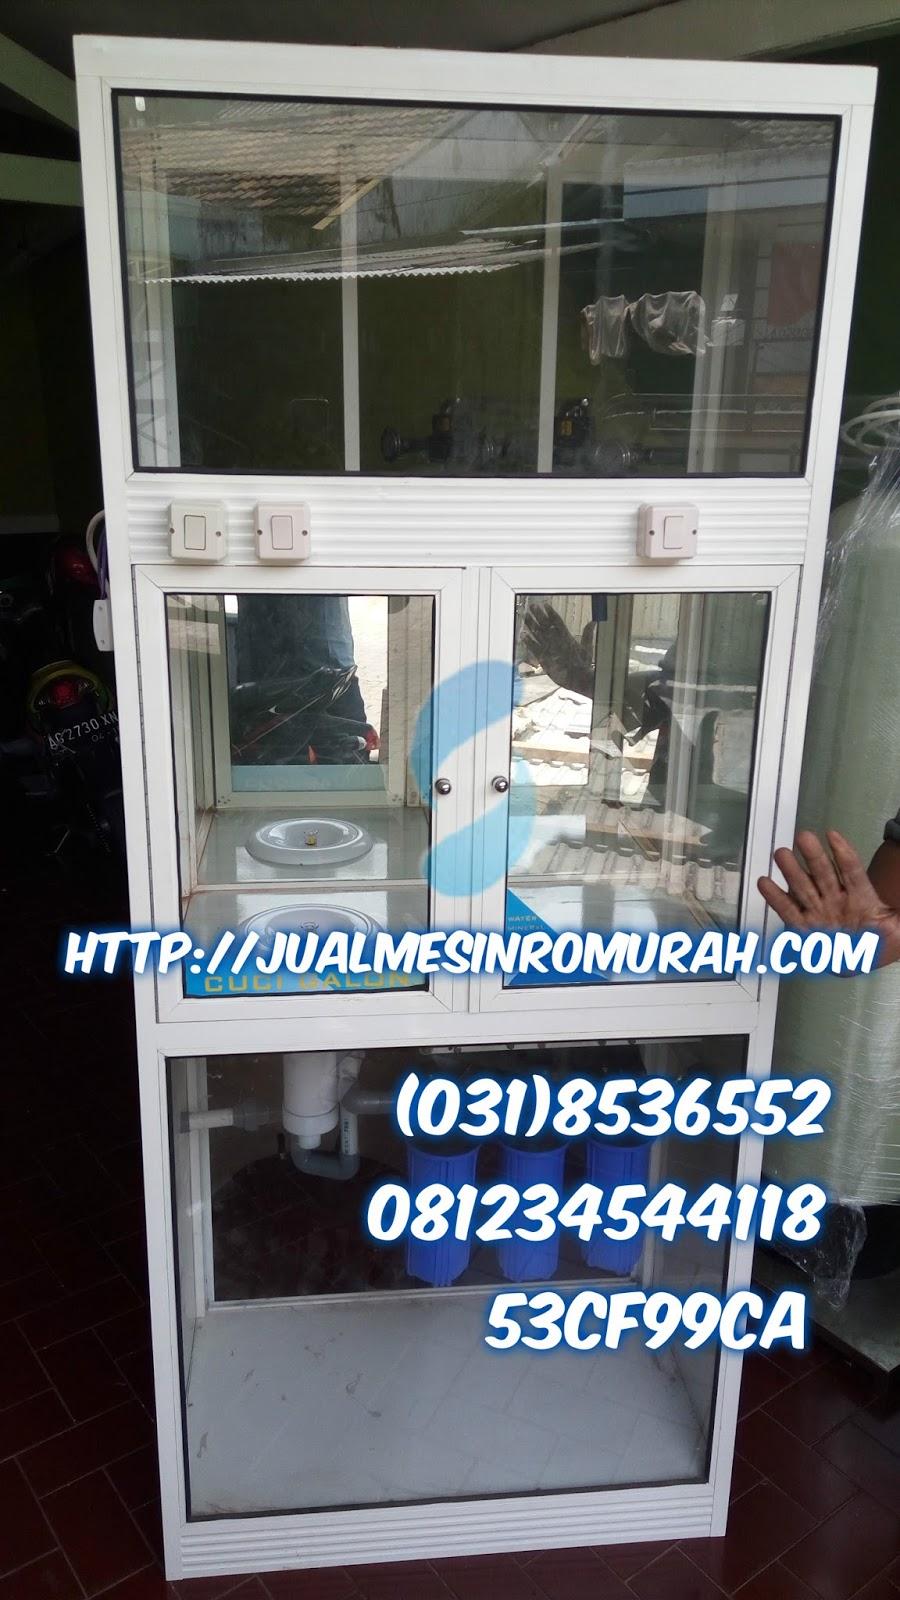 Depo Air Minum Isi Ulang Mesin Reverse Osmosis Tissue Galon Depot Mini Rp 7000000